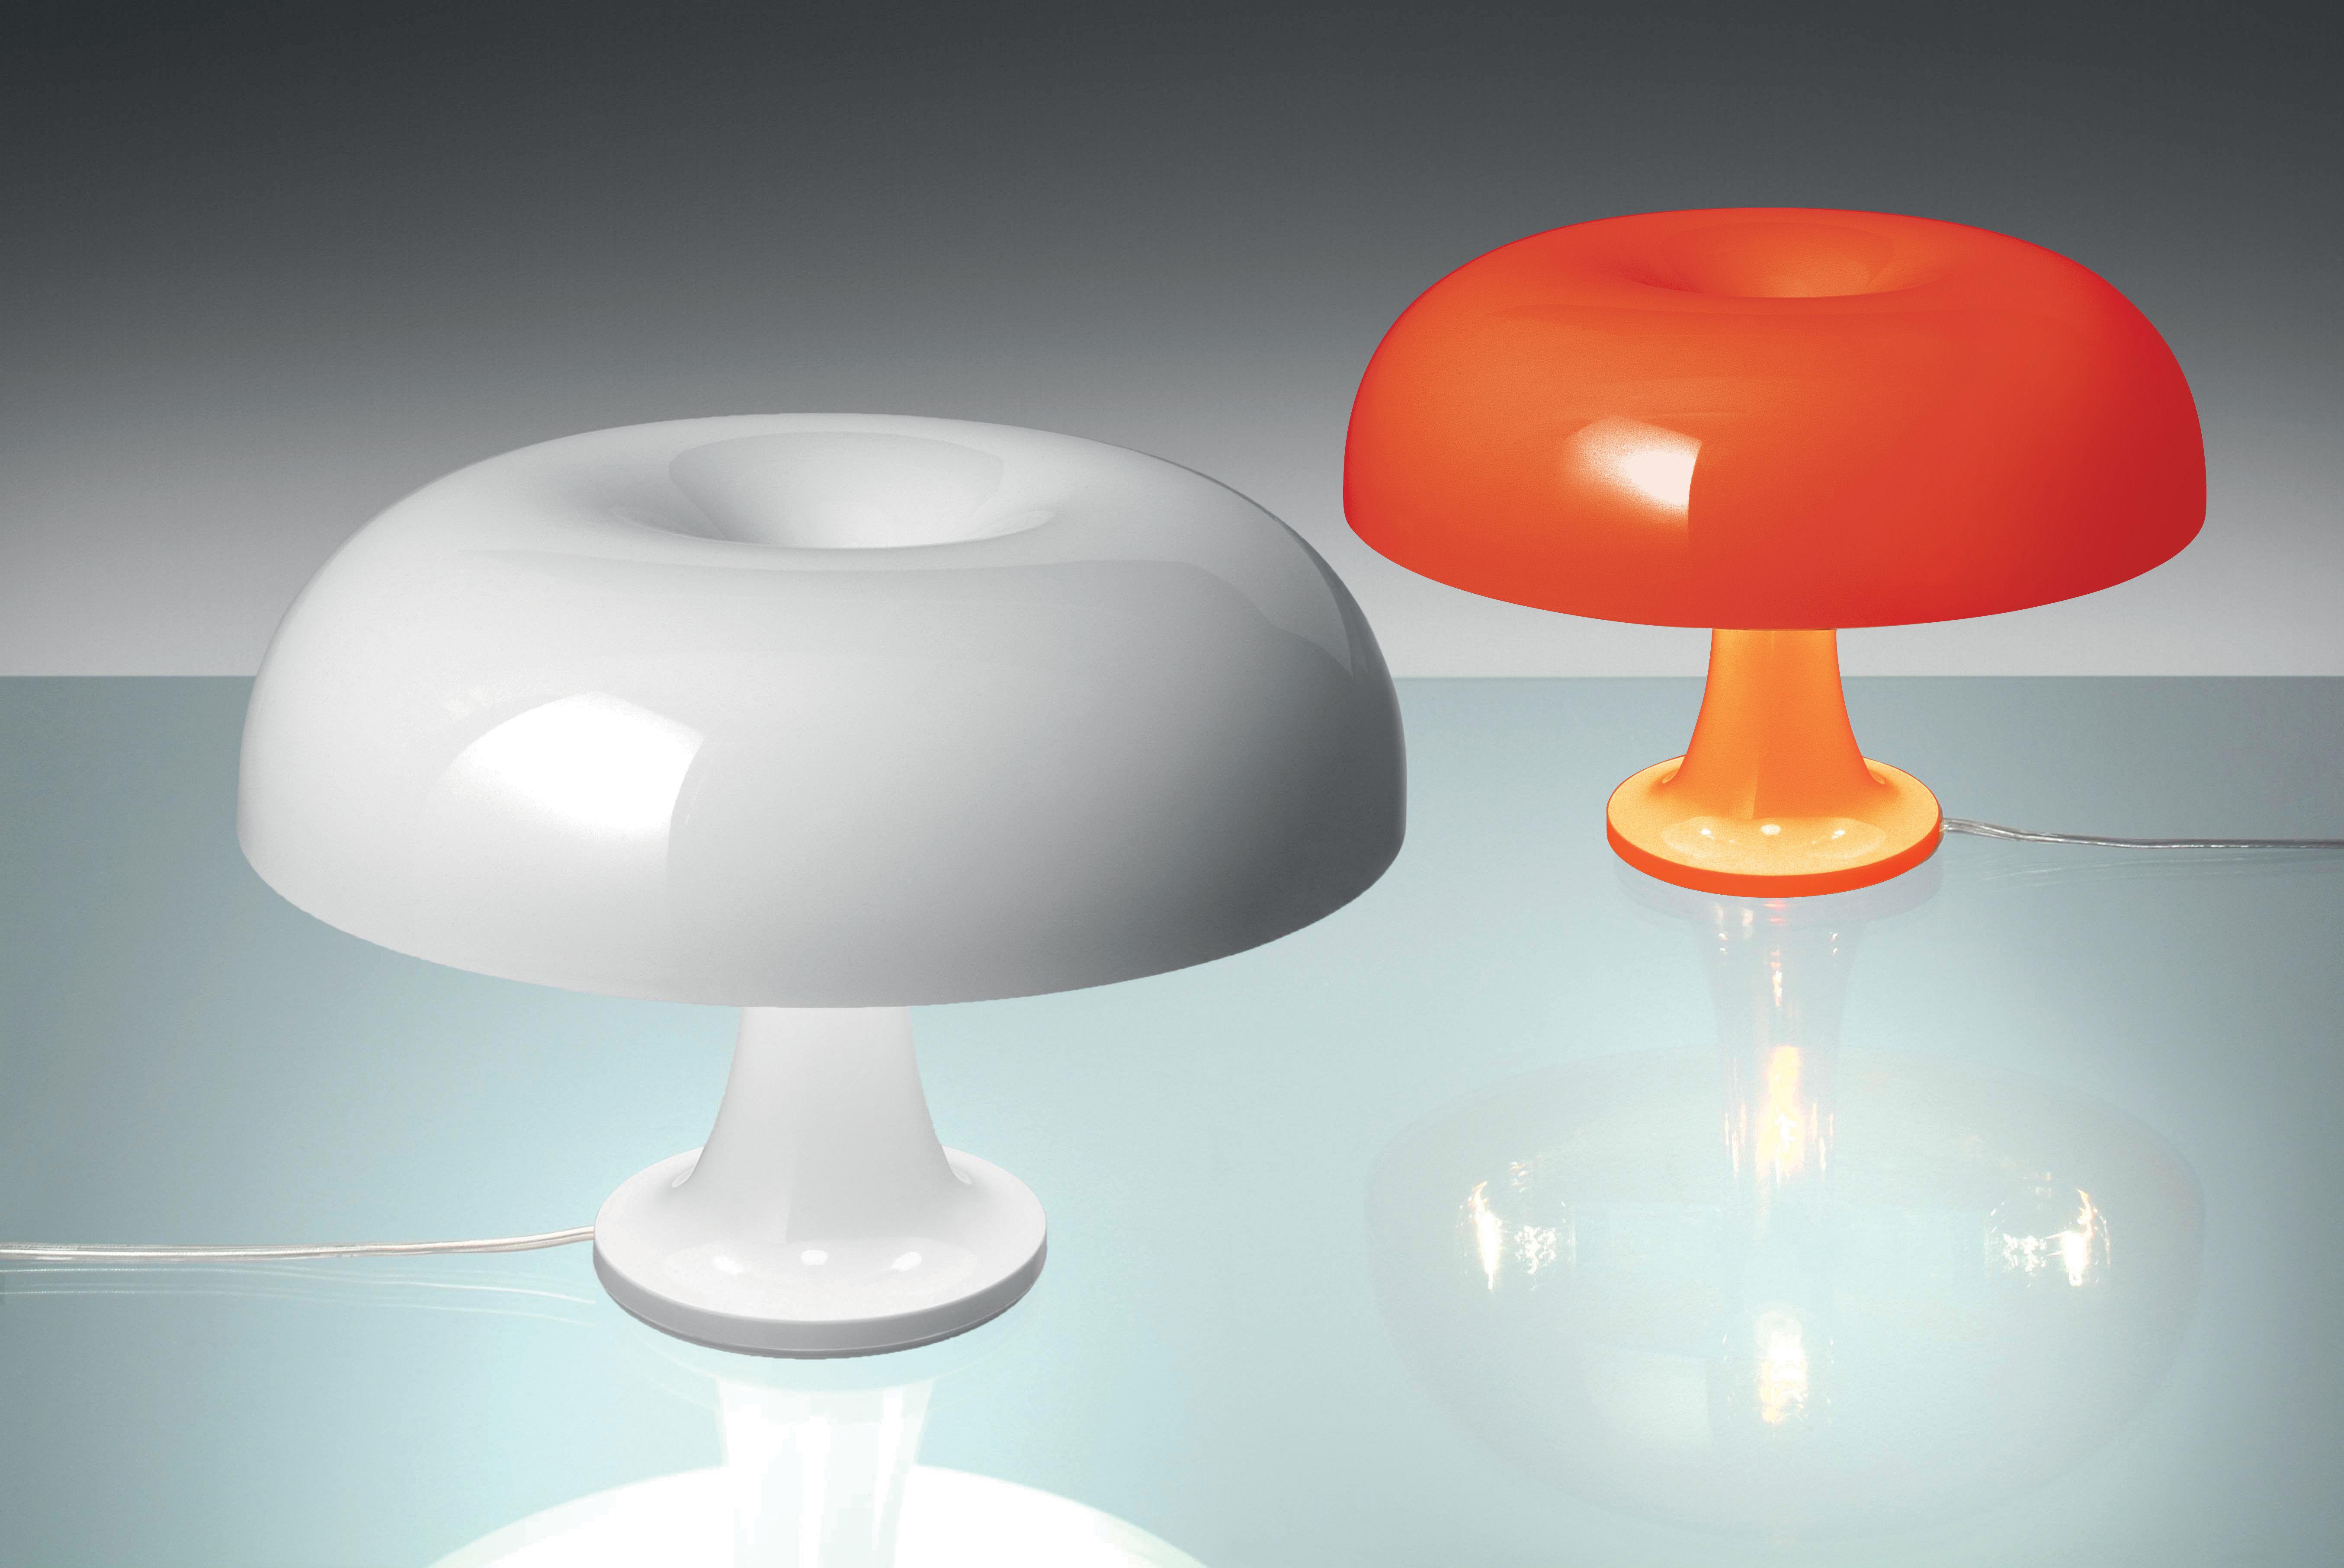 Lampe de table nessino 32 cm orange opaque artemide for Made design